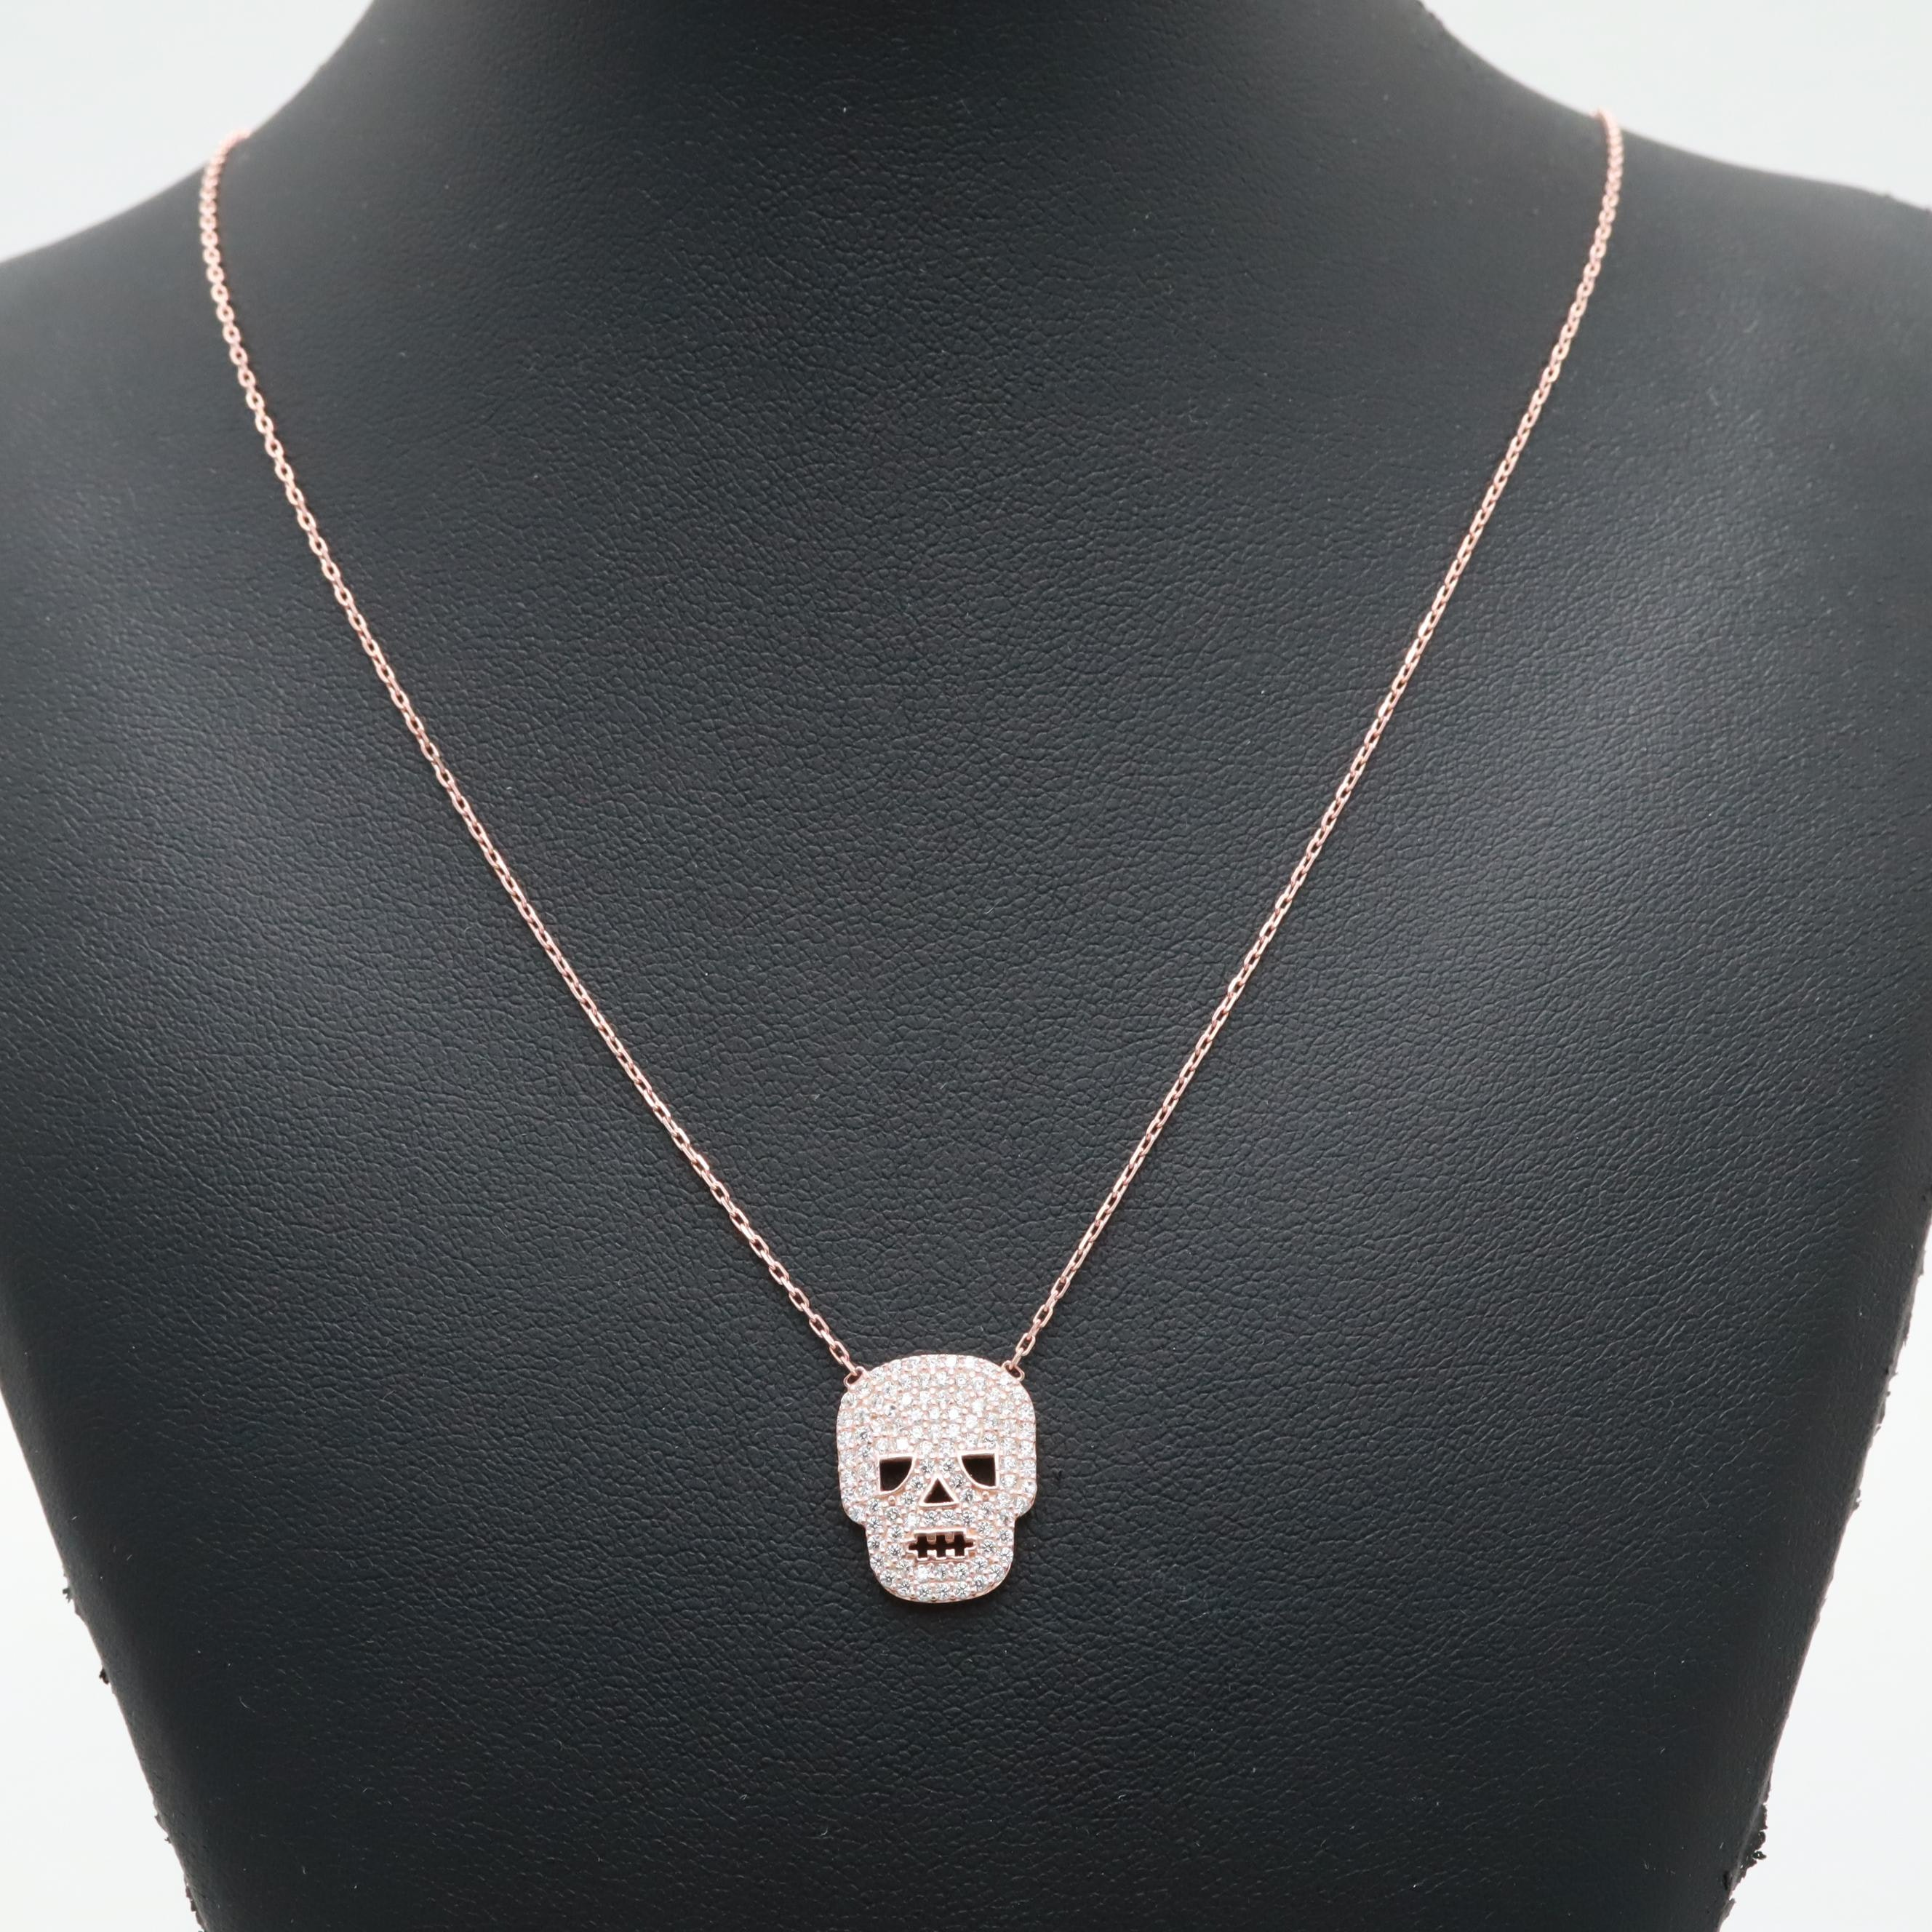 Rose Gold Wash on Sterling Silver Cubic Zirconia Adjustable Skull Necklace